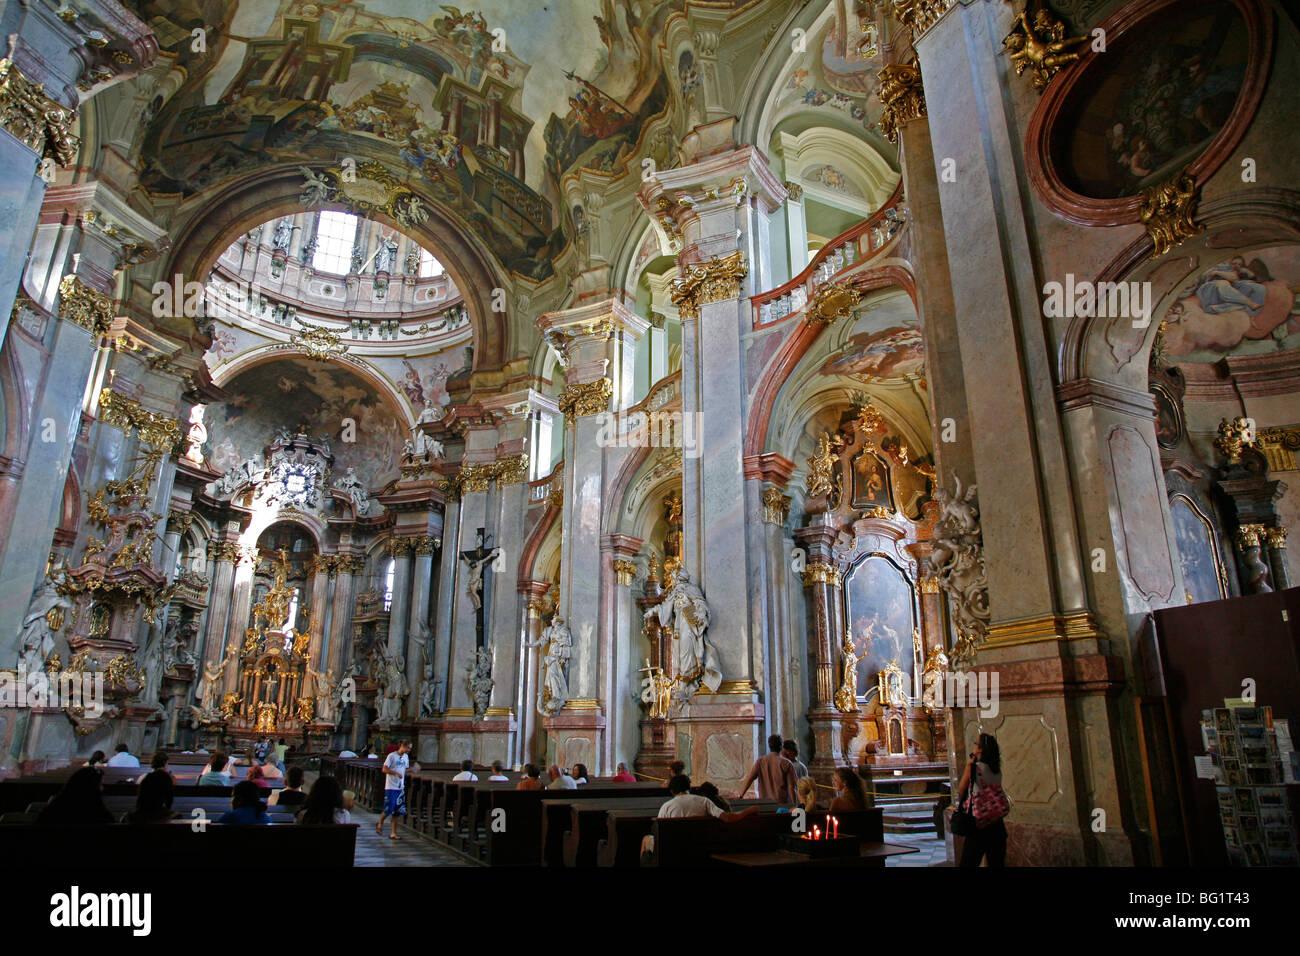 baroque interior photos baroque interior images alamy. Black Bedroom Furniture Sets. Home Design Ideas